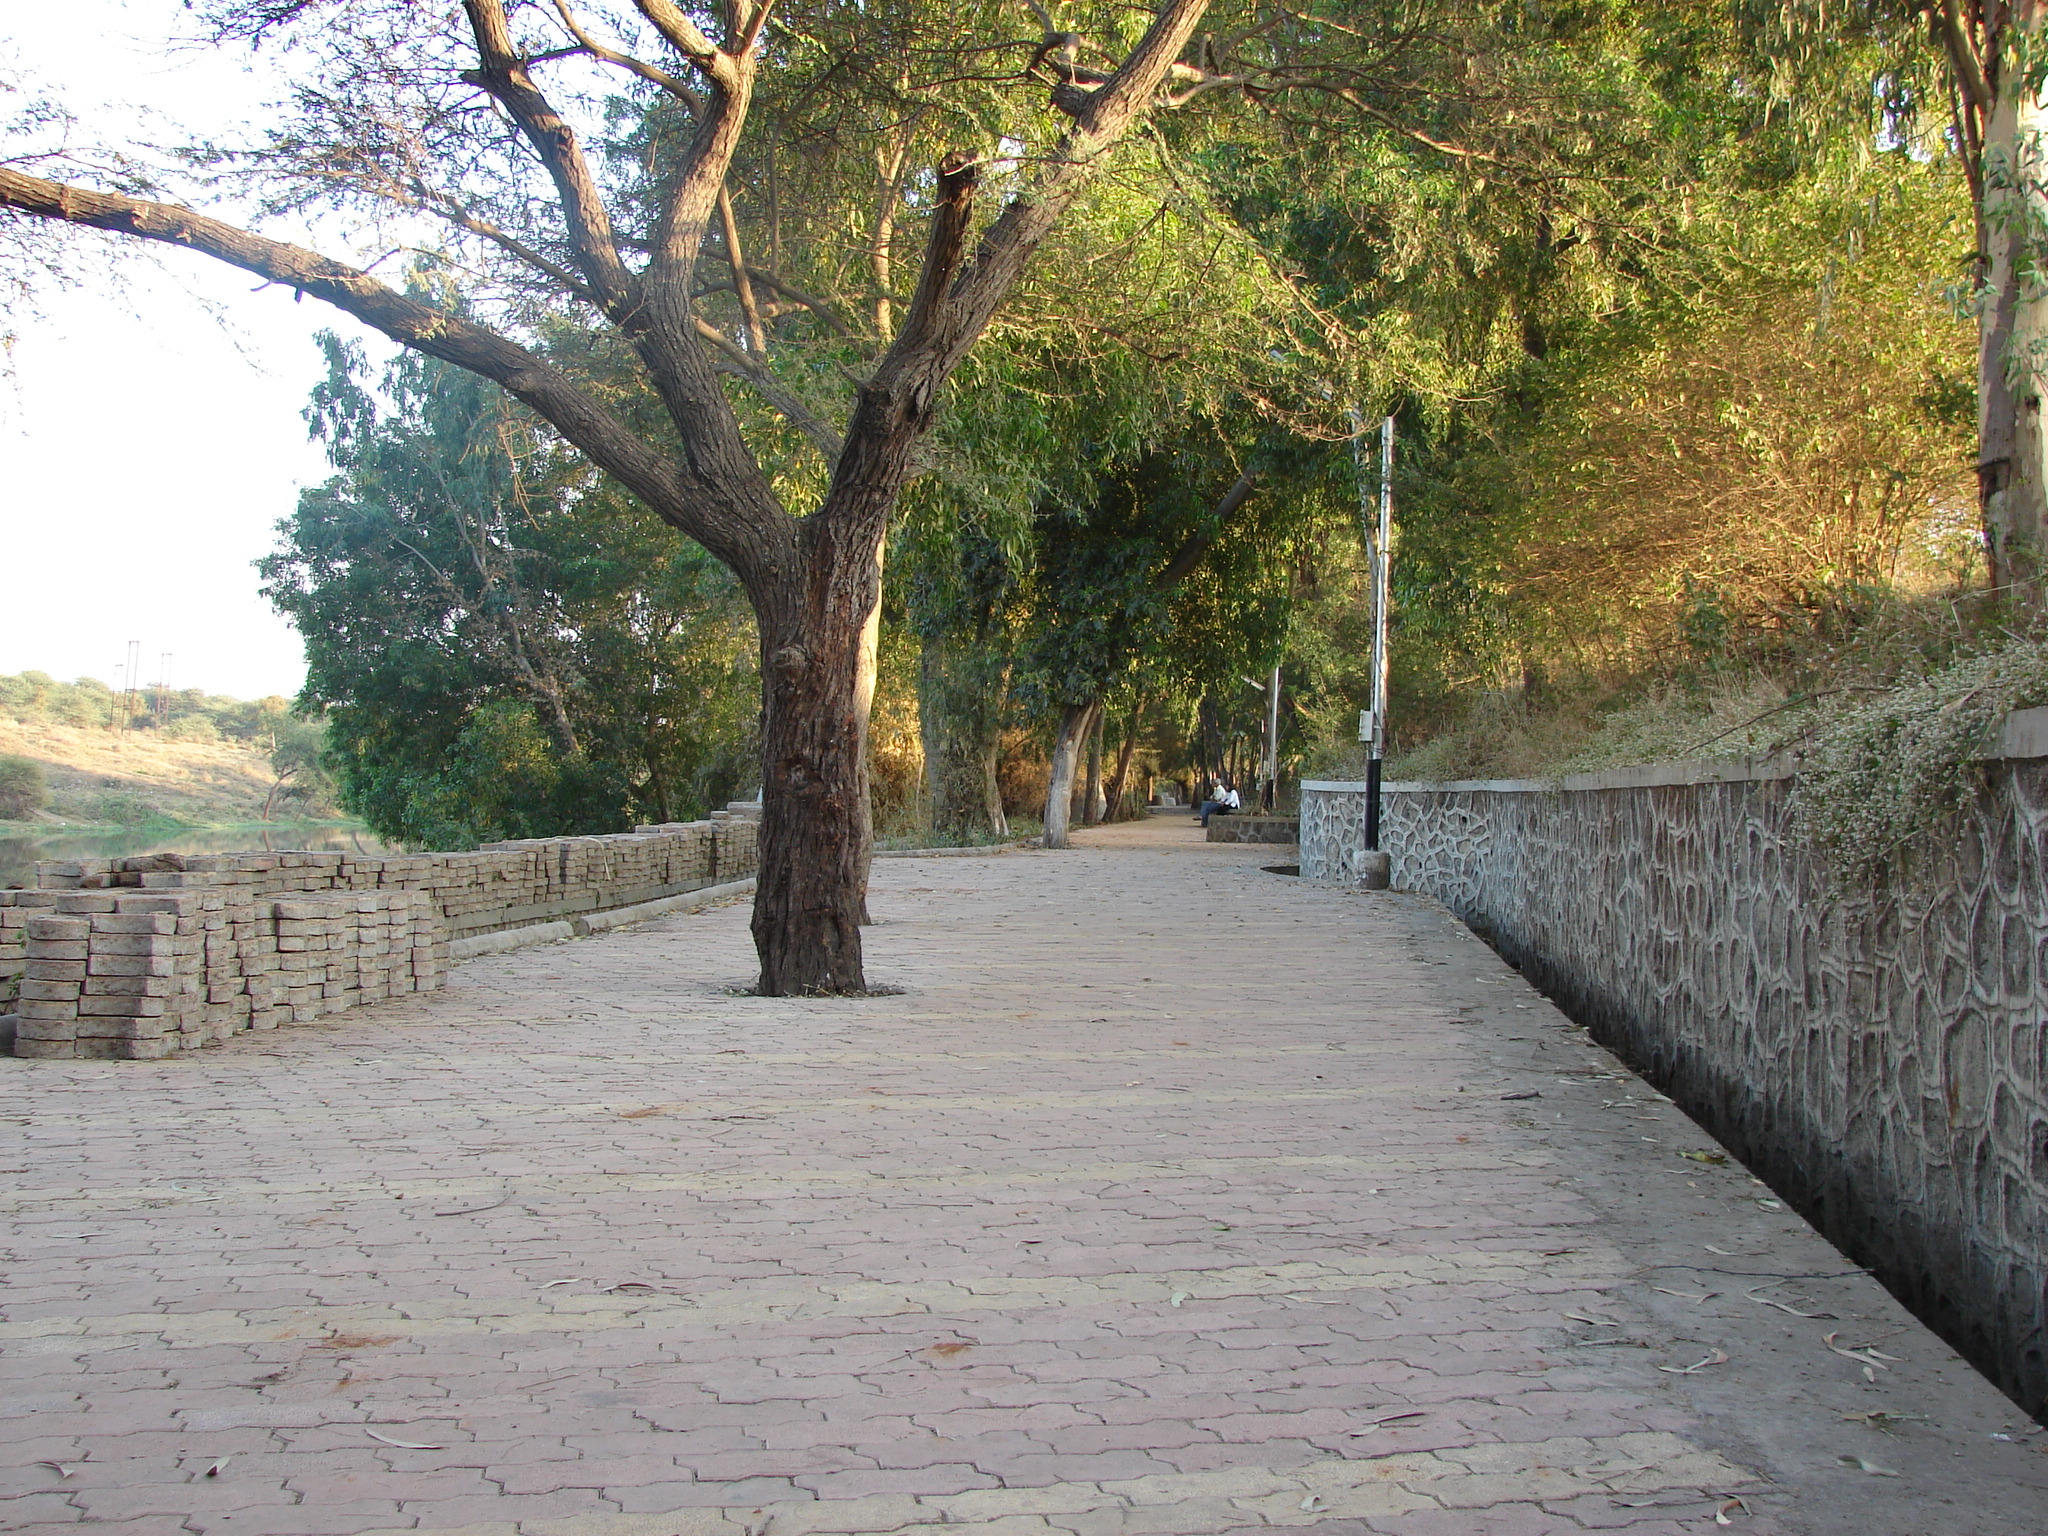 Godapark: a pedestrian street near Godavari River